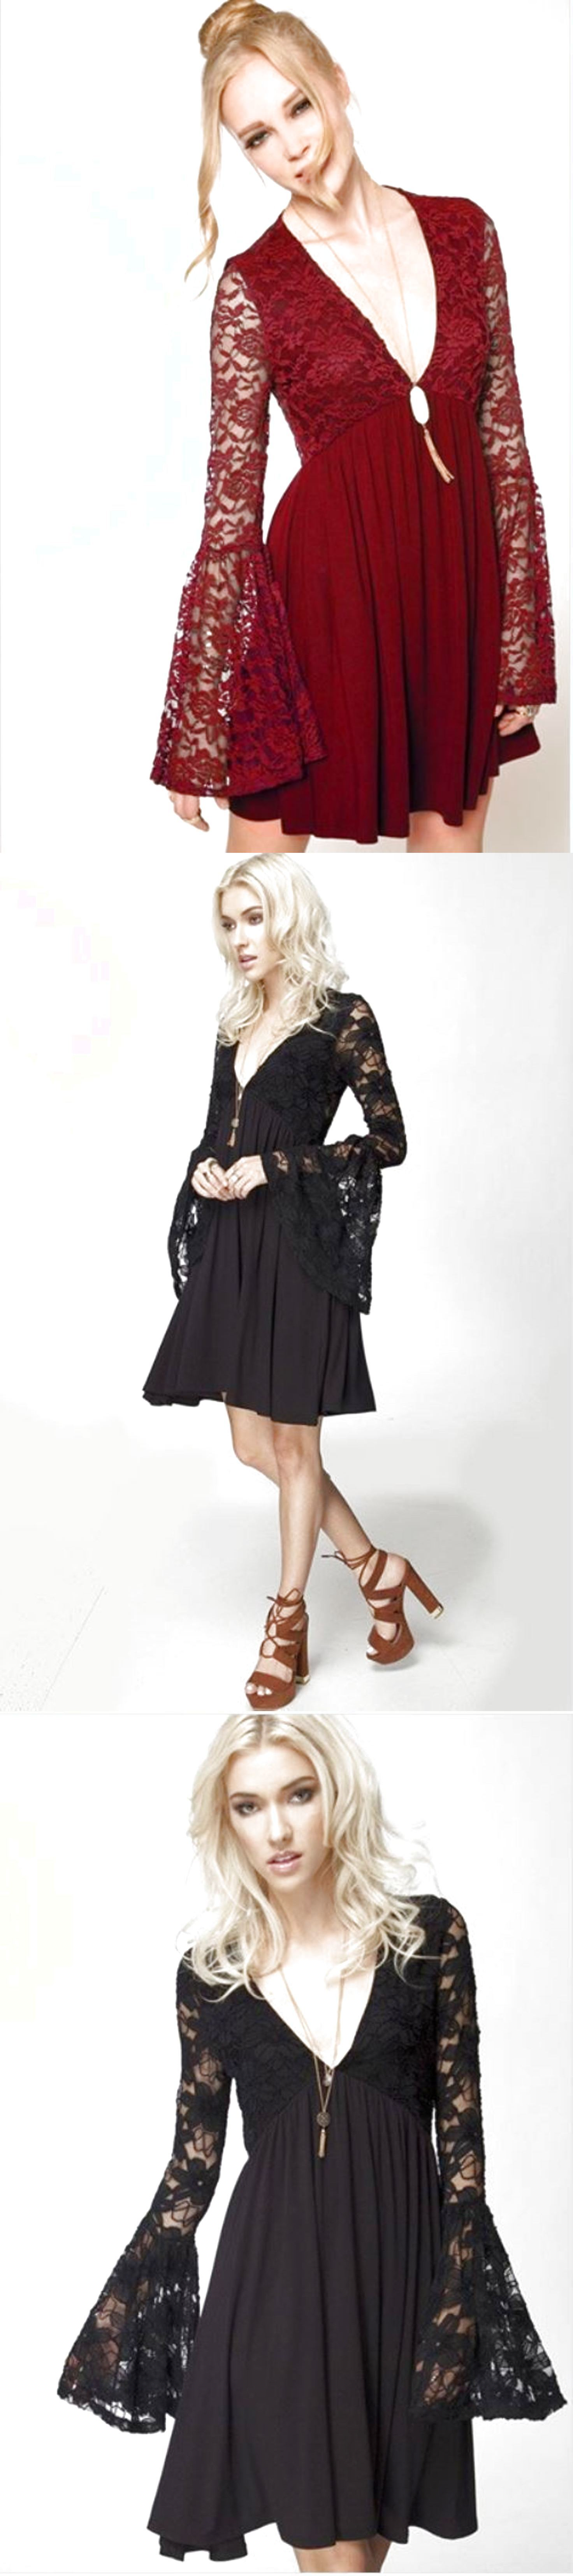 Womens new long bell sleeve solid black lace swing dress tunic boho